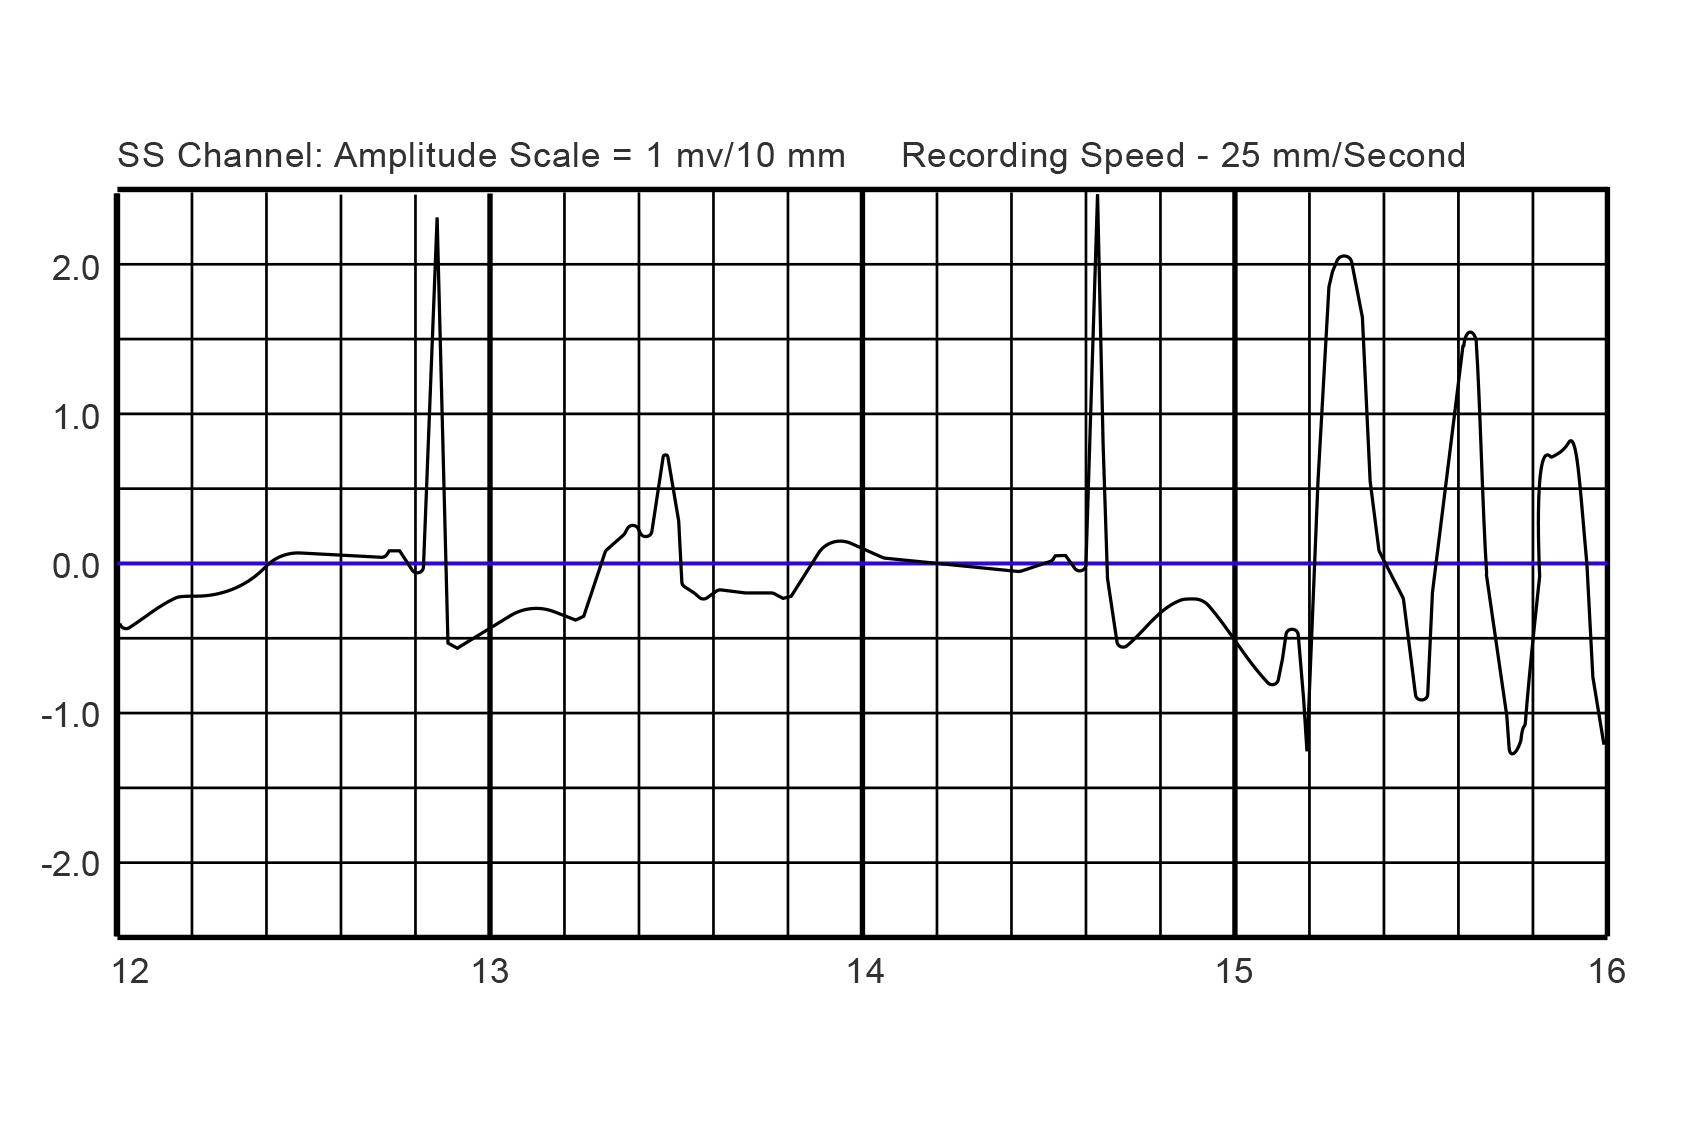 Lifevest amplitude chart